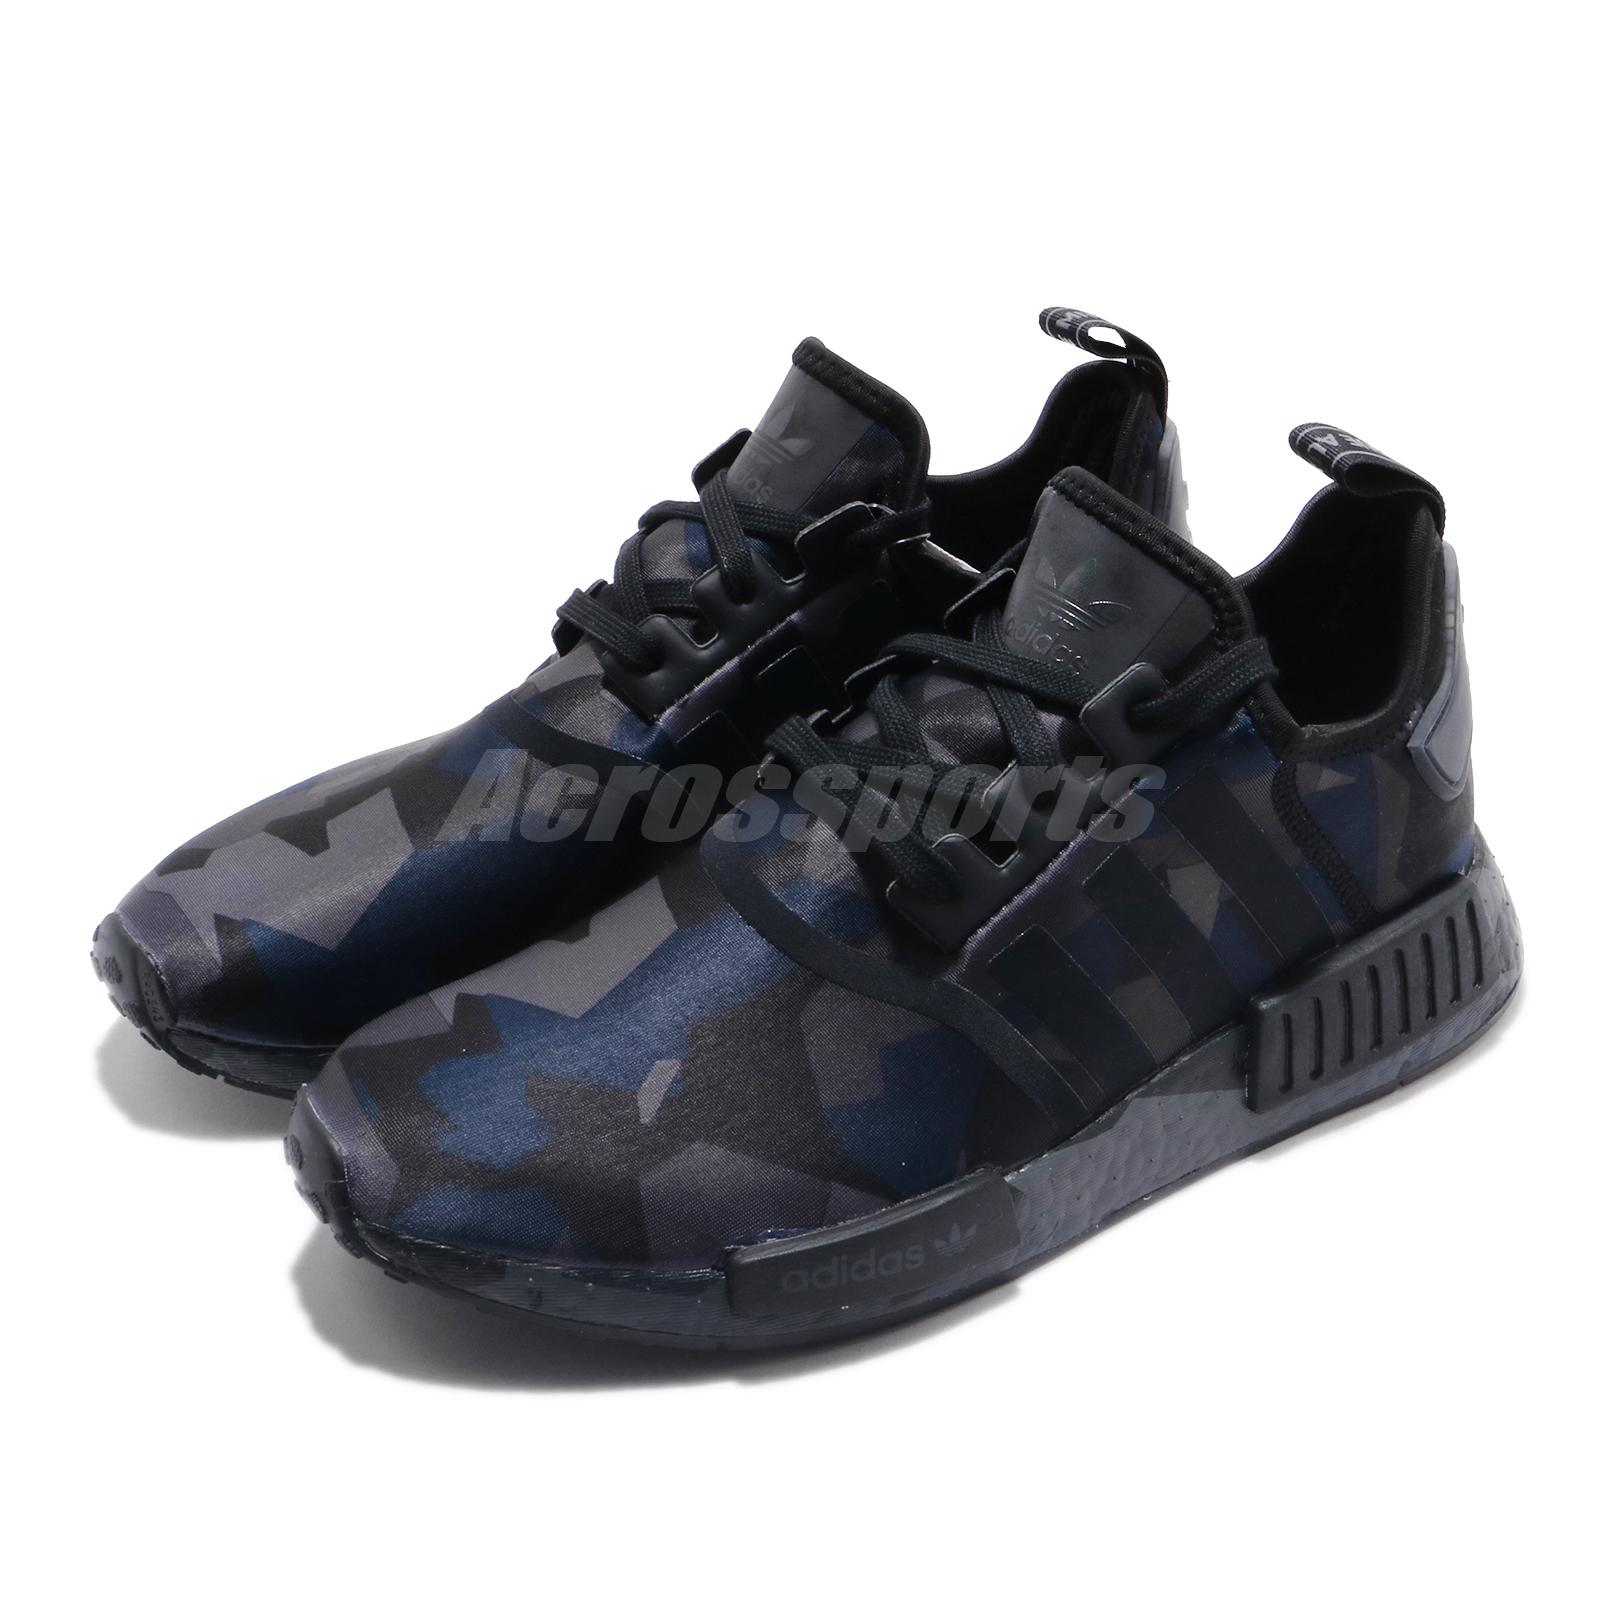 Adidas Originals Nmd R1 Shoe Mens Casual 11 5 Black Grey